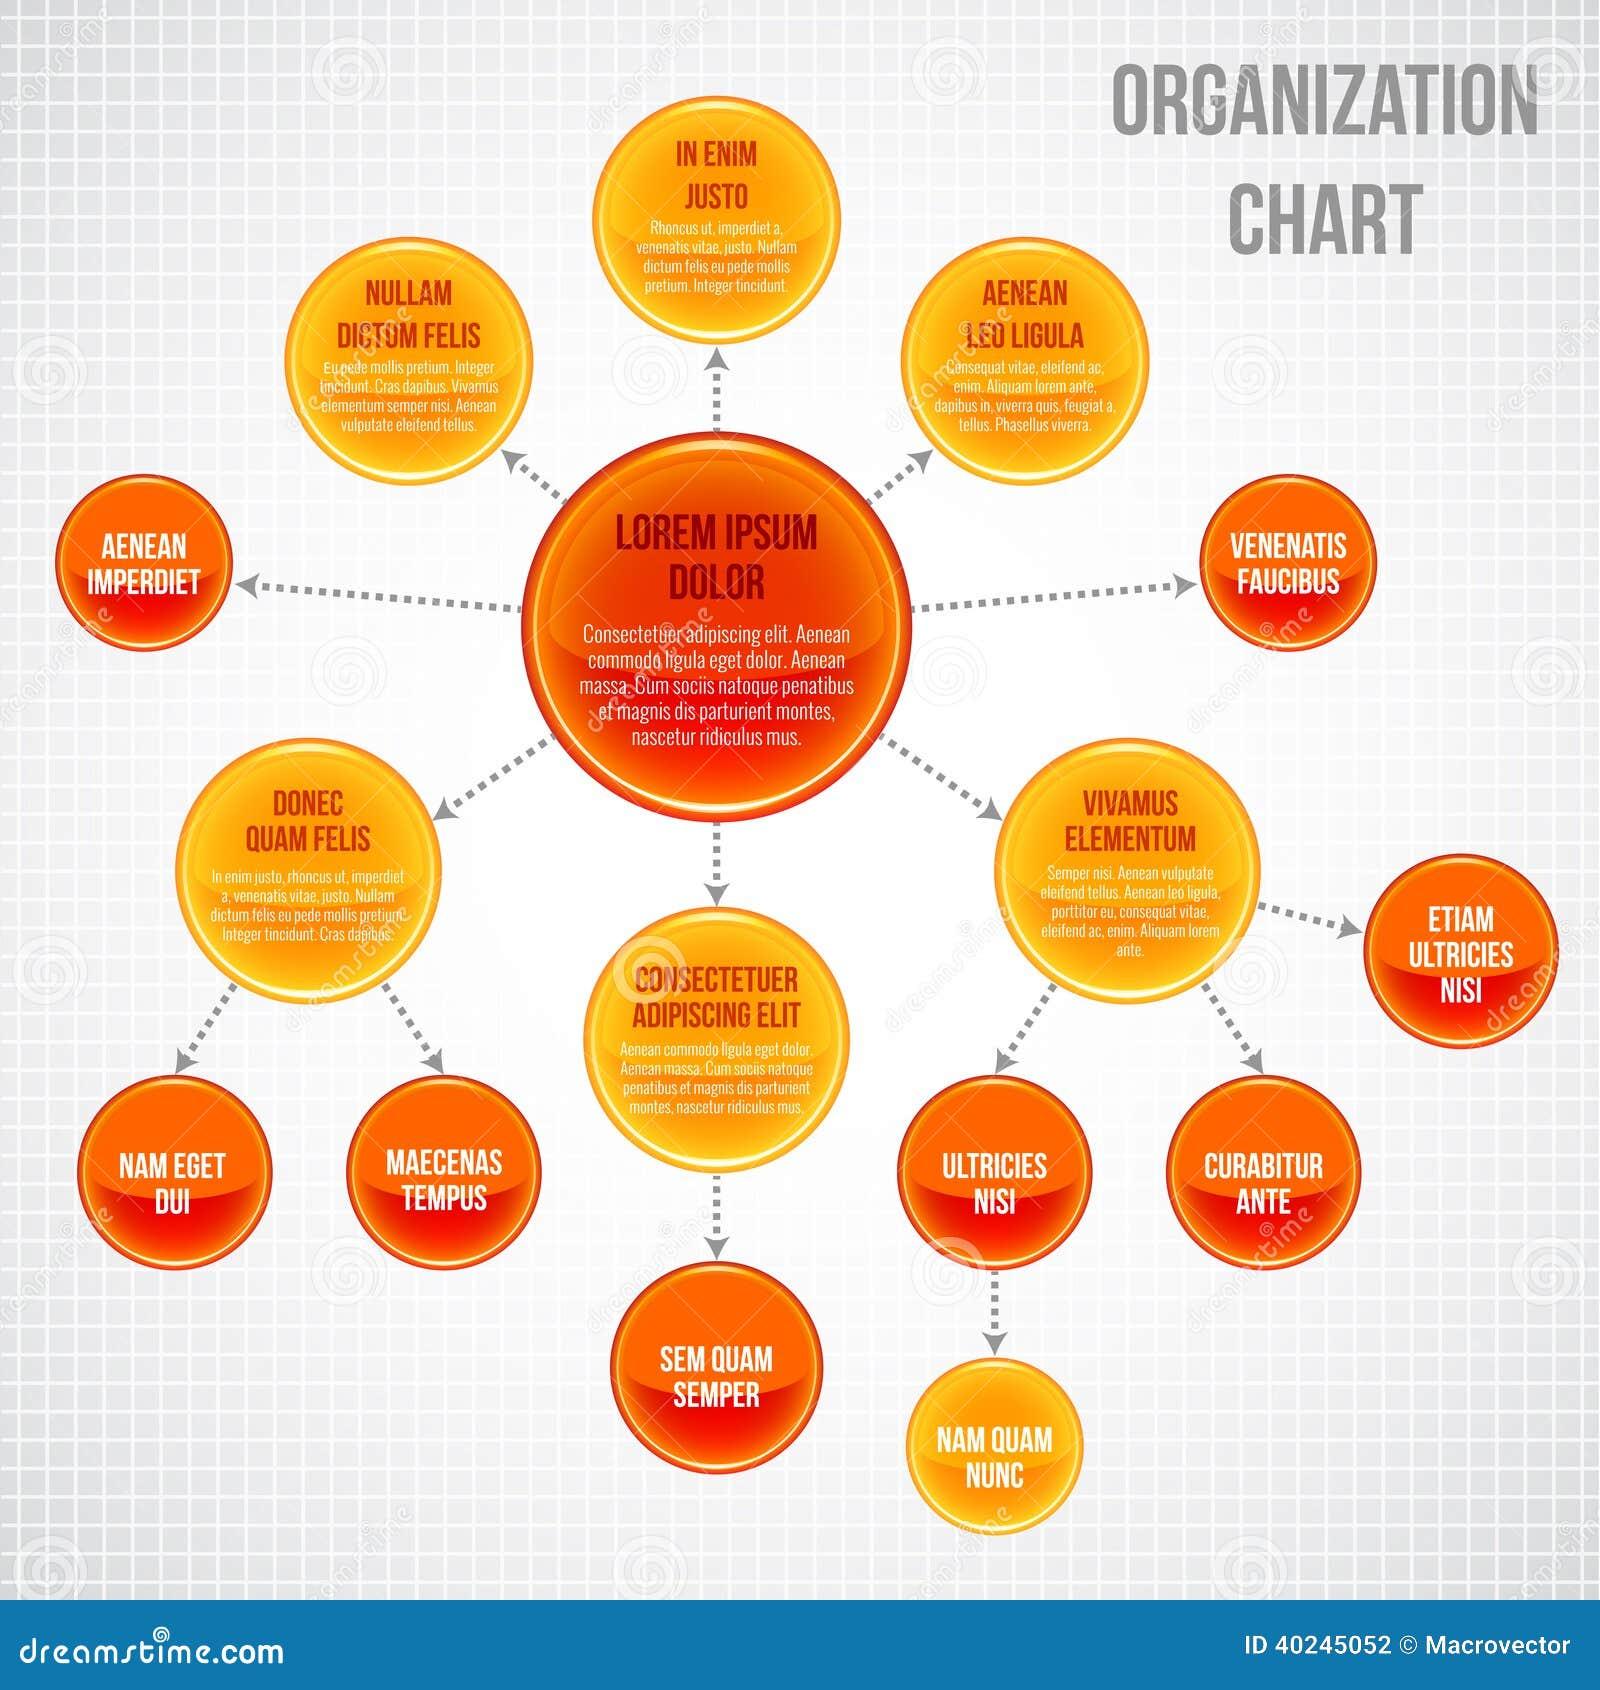 organizational chart infographic stock vector   image    organizational chart infographic